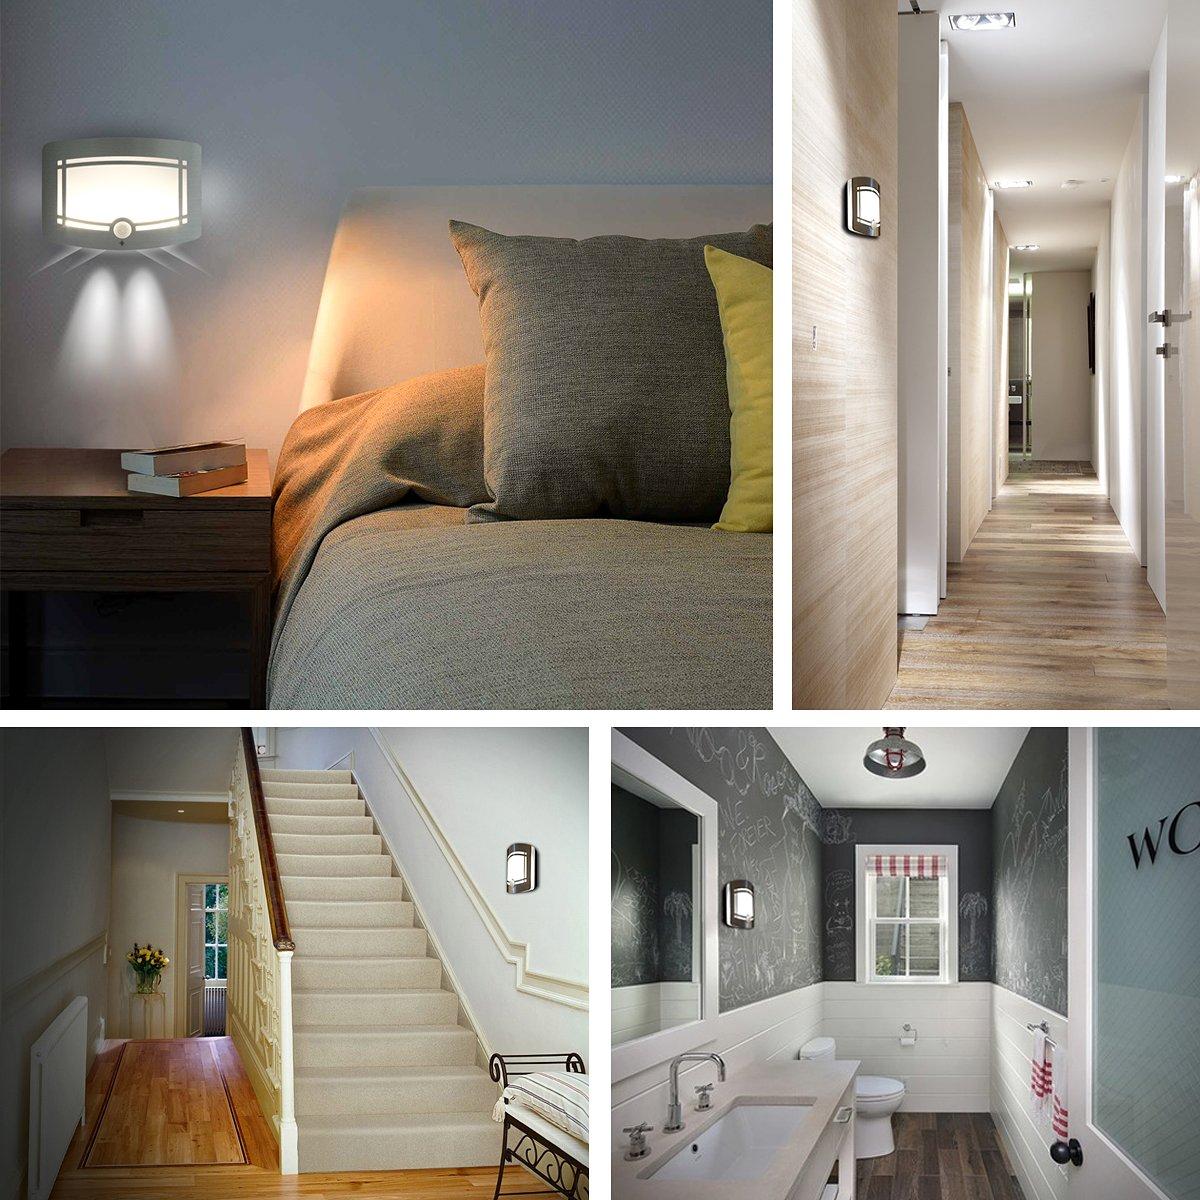 Motion Sensor LED Night Light,Wireless Battery Powered Wall Lamp,Stick Anywhere Wall Sconce,Aluminum Case Closet Light,Safe Light for Stair, Hallway,Bathrom,Bedroom,Kitchen by Kalefu (Image #6)